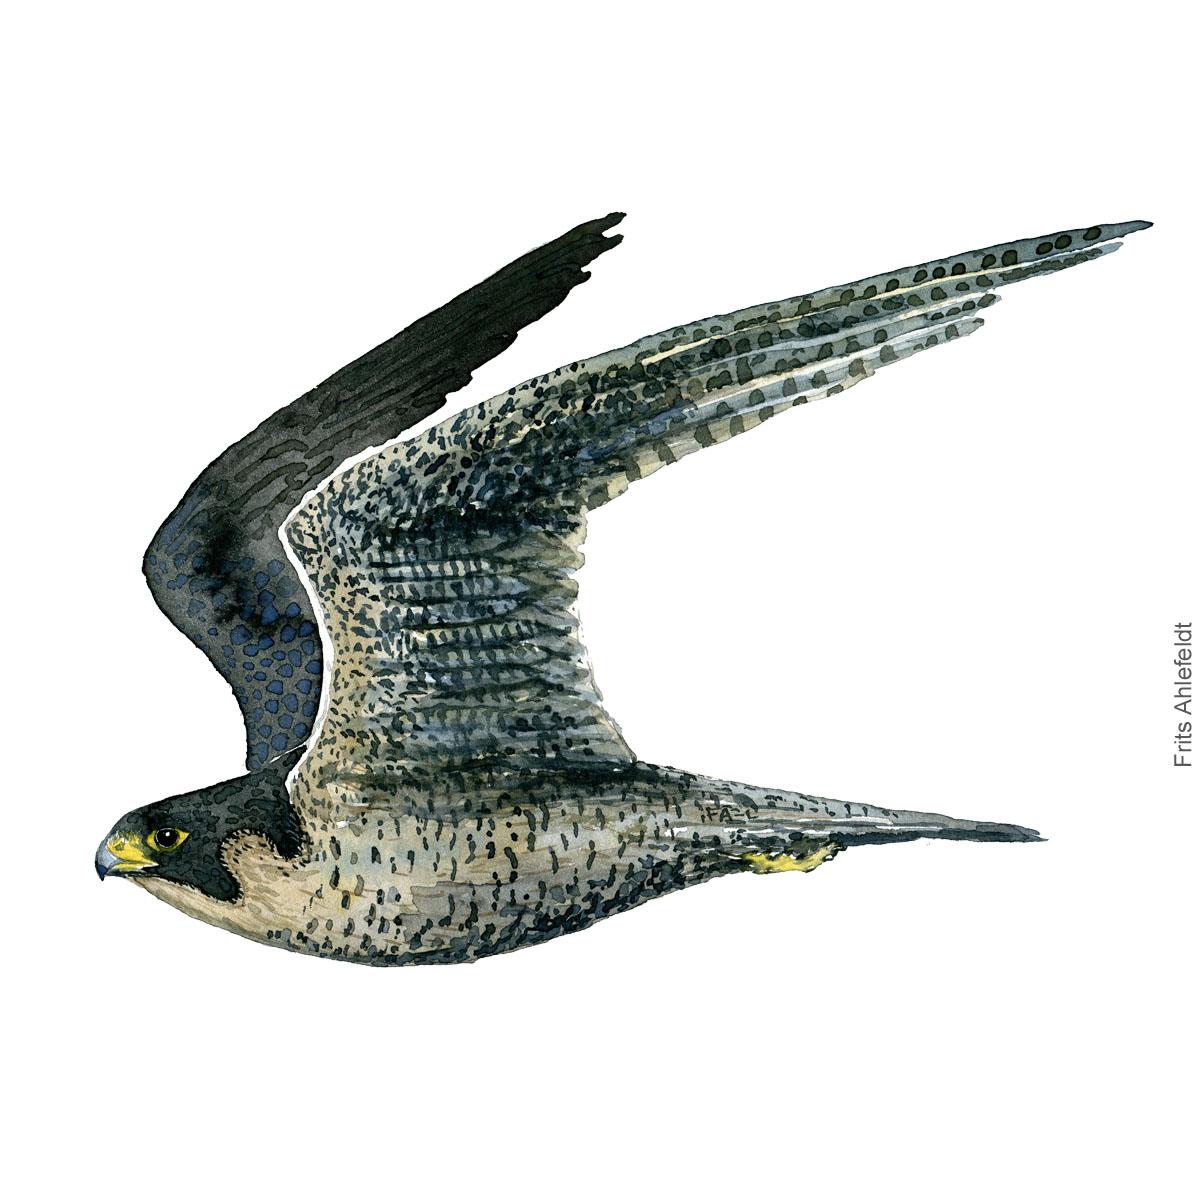 Vandrefalk - Peregrine falcon - Bird painting in watercolor by Frits Ahlefeldt - Fugle akvarel